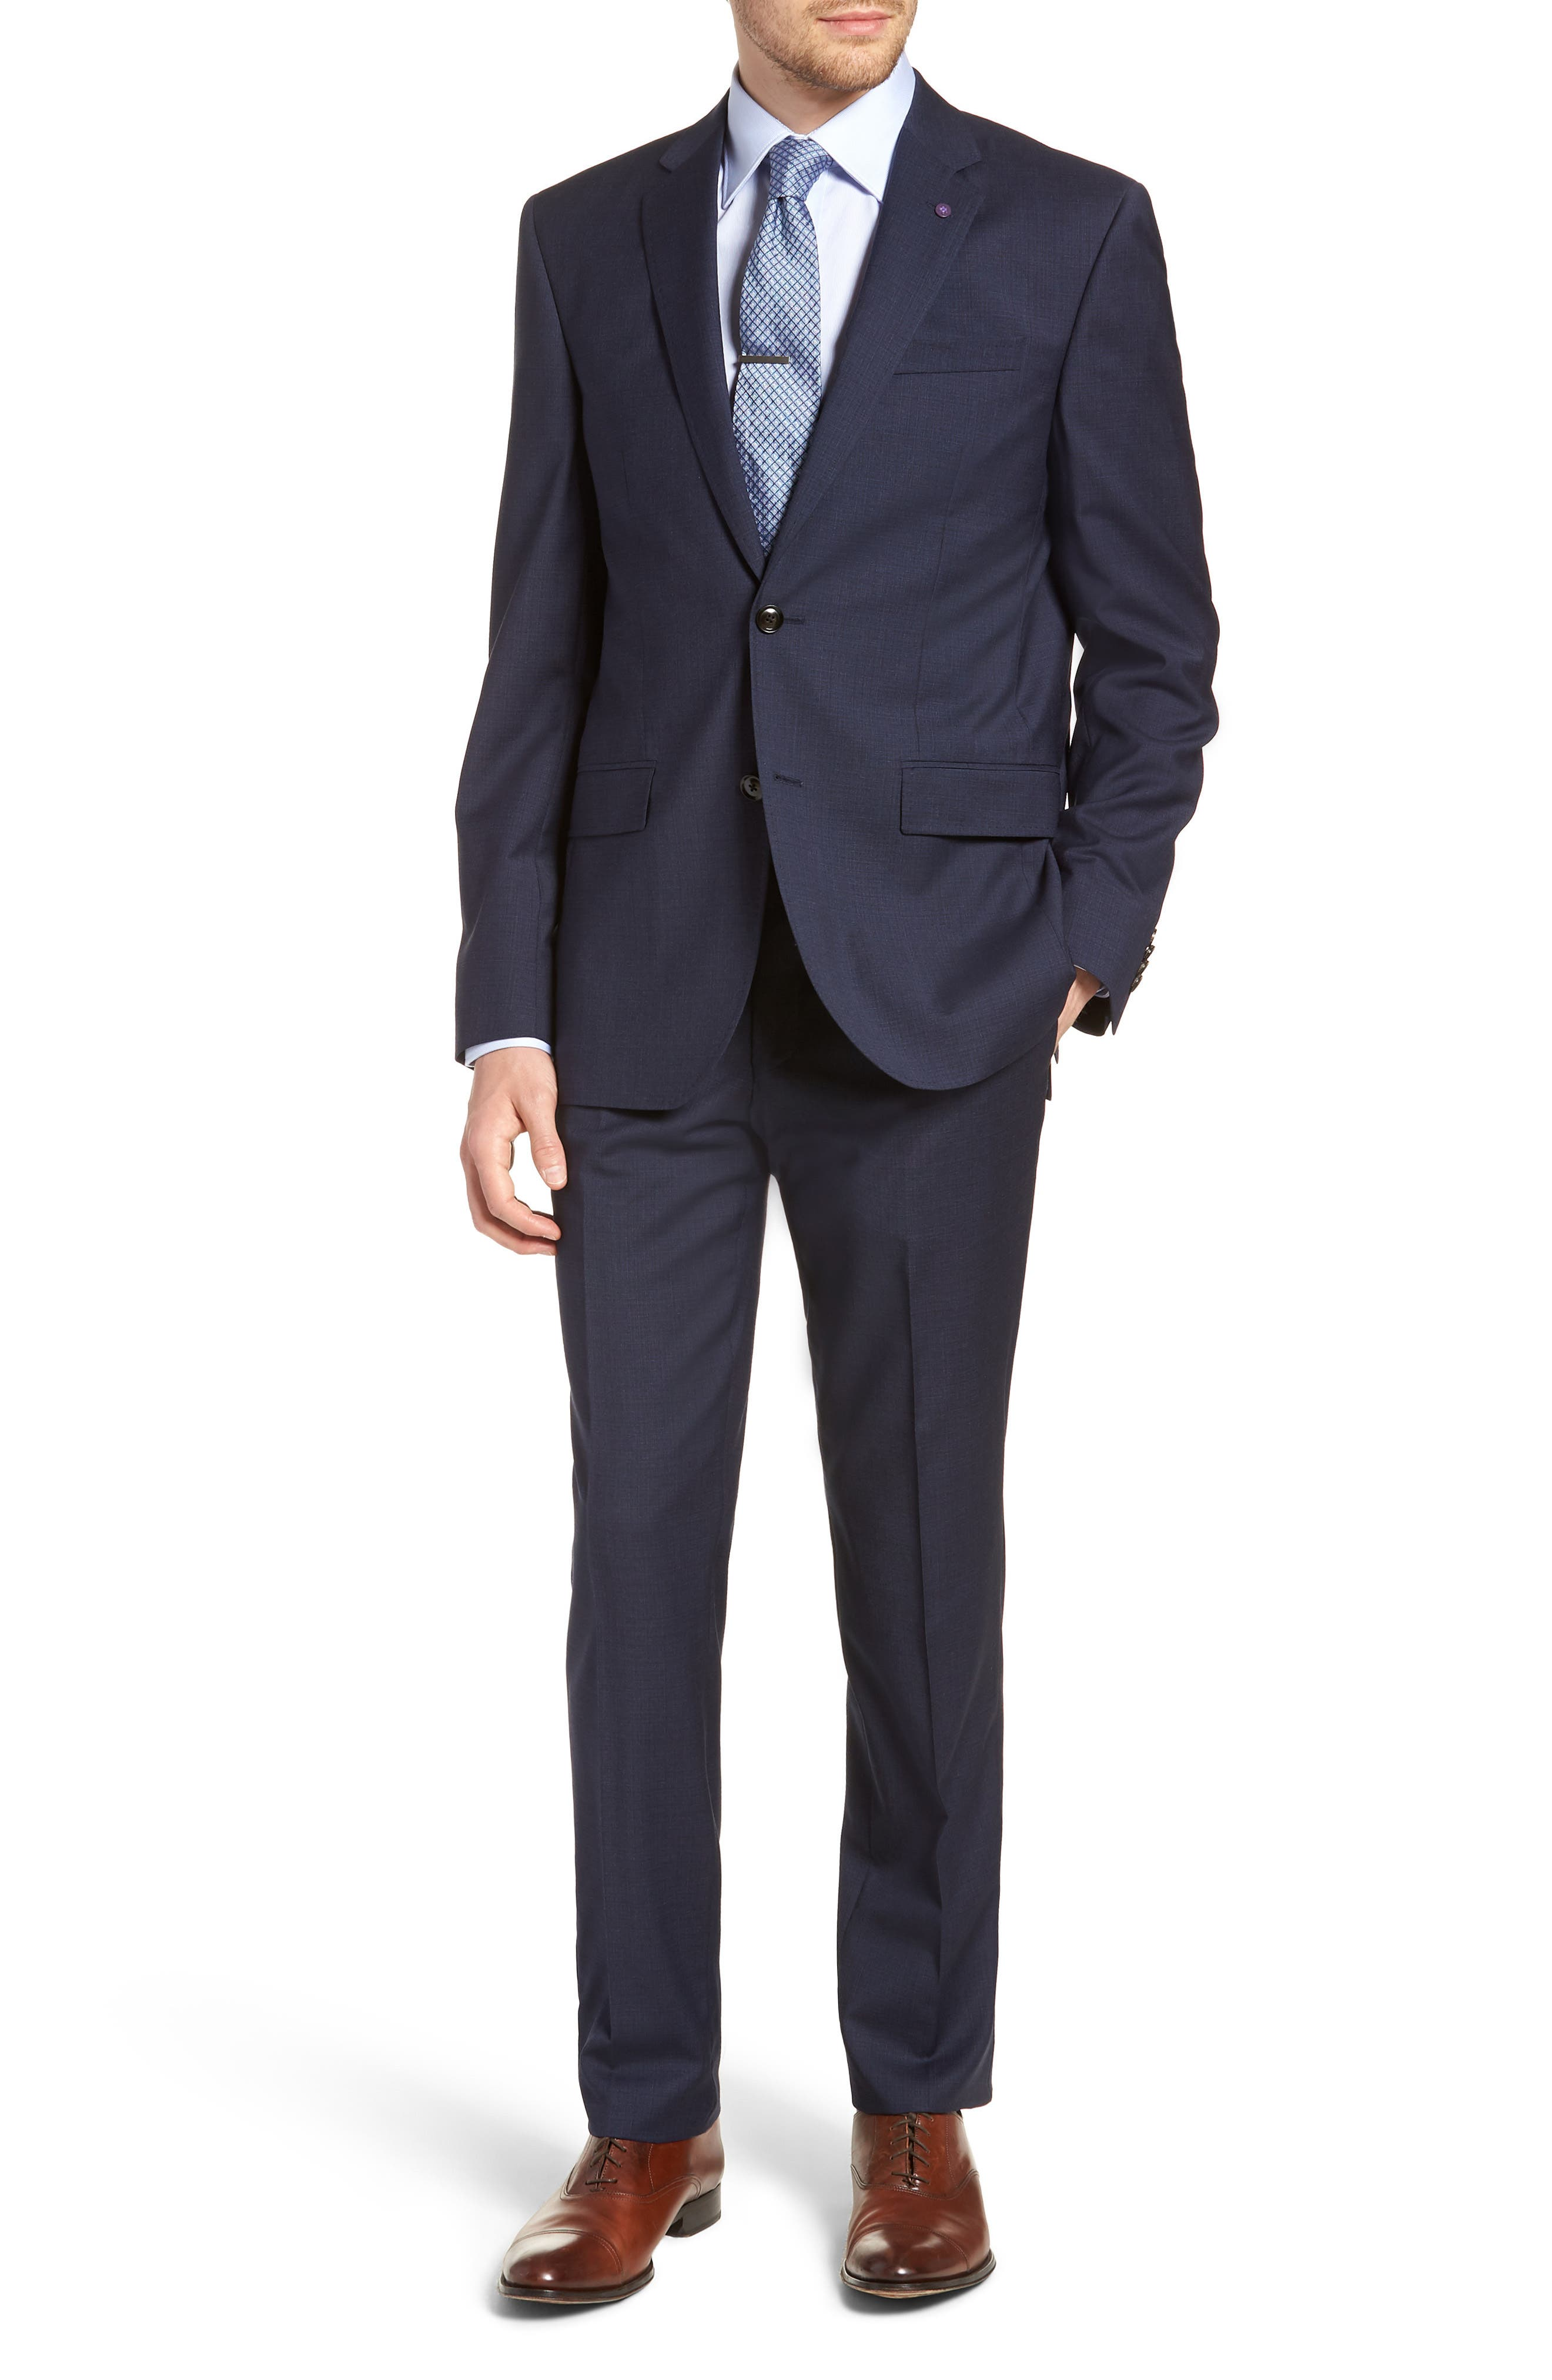 Jay Trim Fit Solid Wool Suit,                             Main thumbnail 1, color,                             Blue